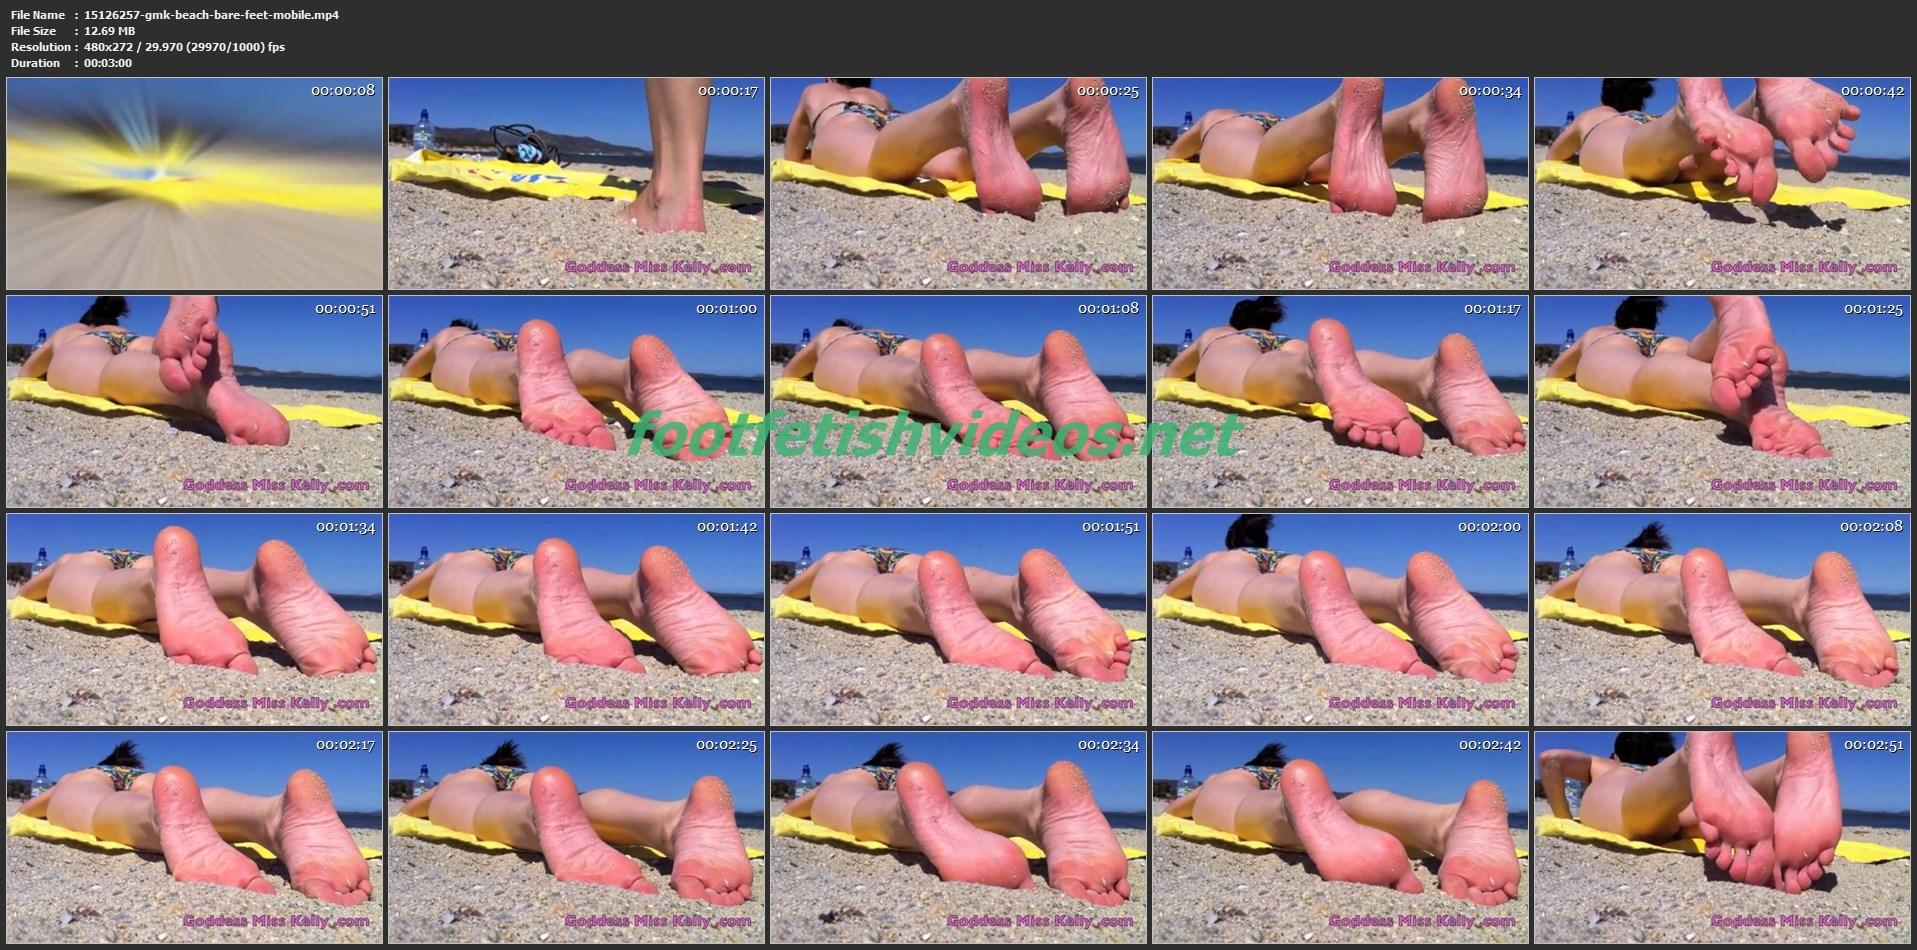 goddessmskelly-15126257-gmk-beach-bare-feet-mobile-mp4